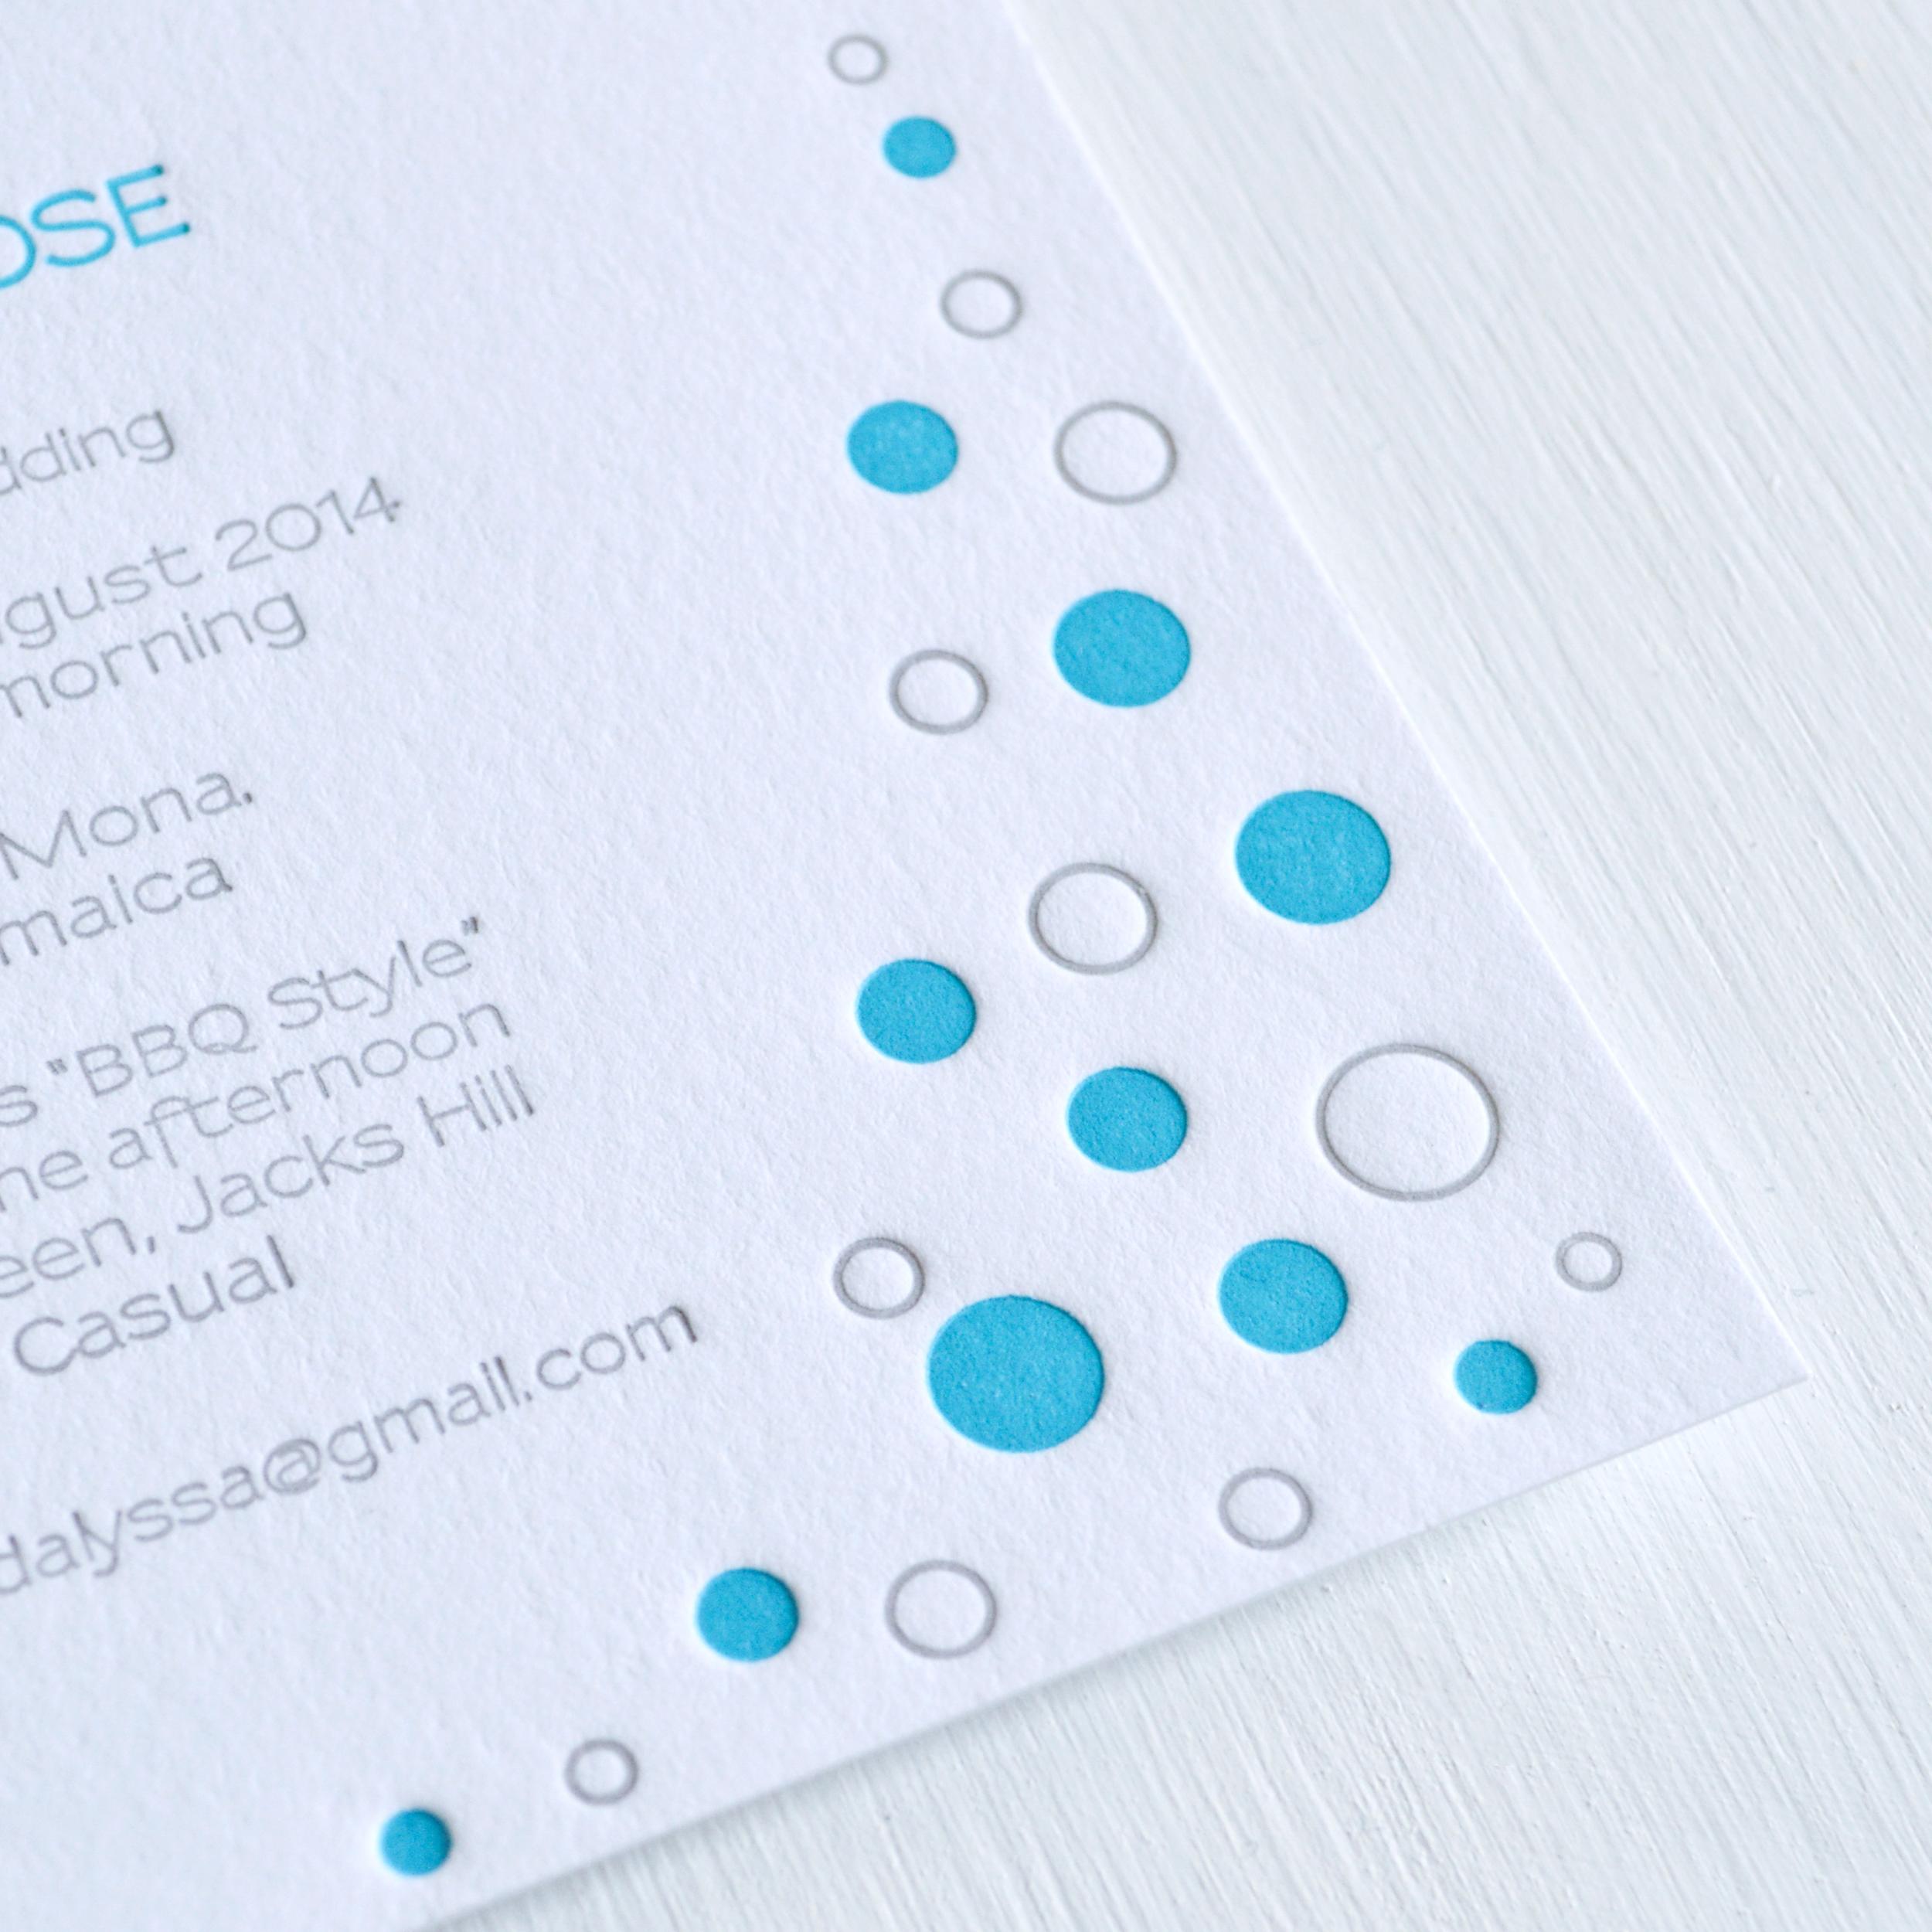 teal and grey backyard bbq letterpress wedding invitation 3.jpg